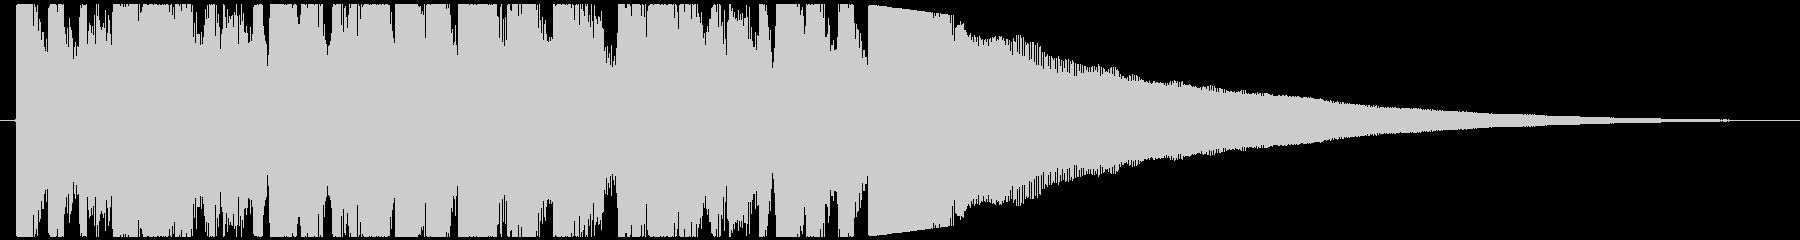 VP・CM 癒やし系ピアノのサウンドロゴの未再生の波形